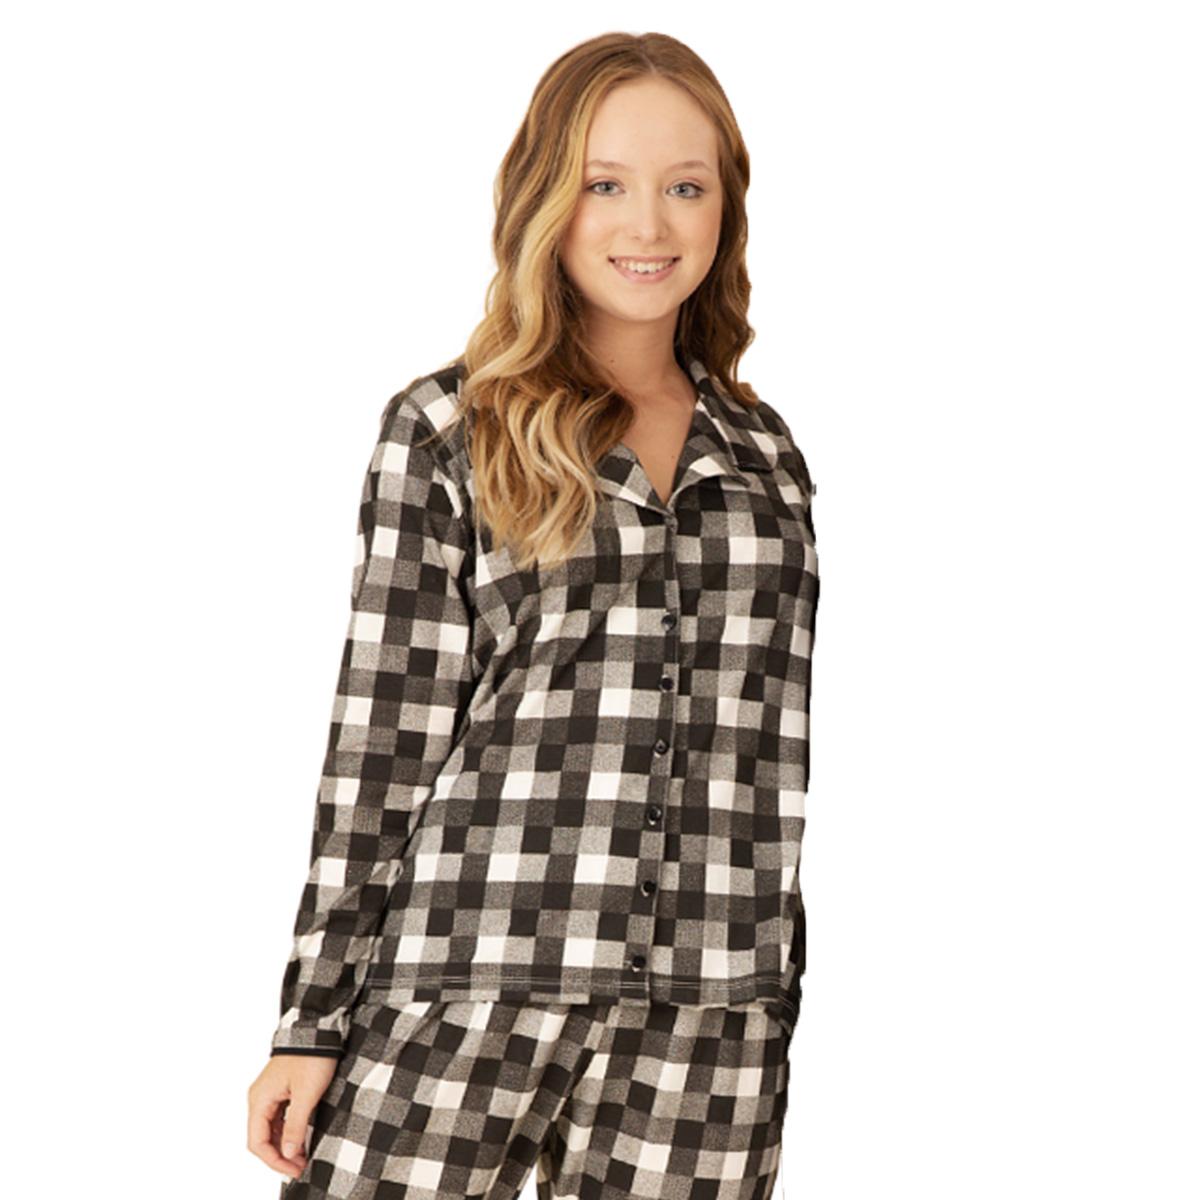 Pijama feminino americano botão xadrez preto algodão